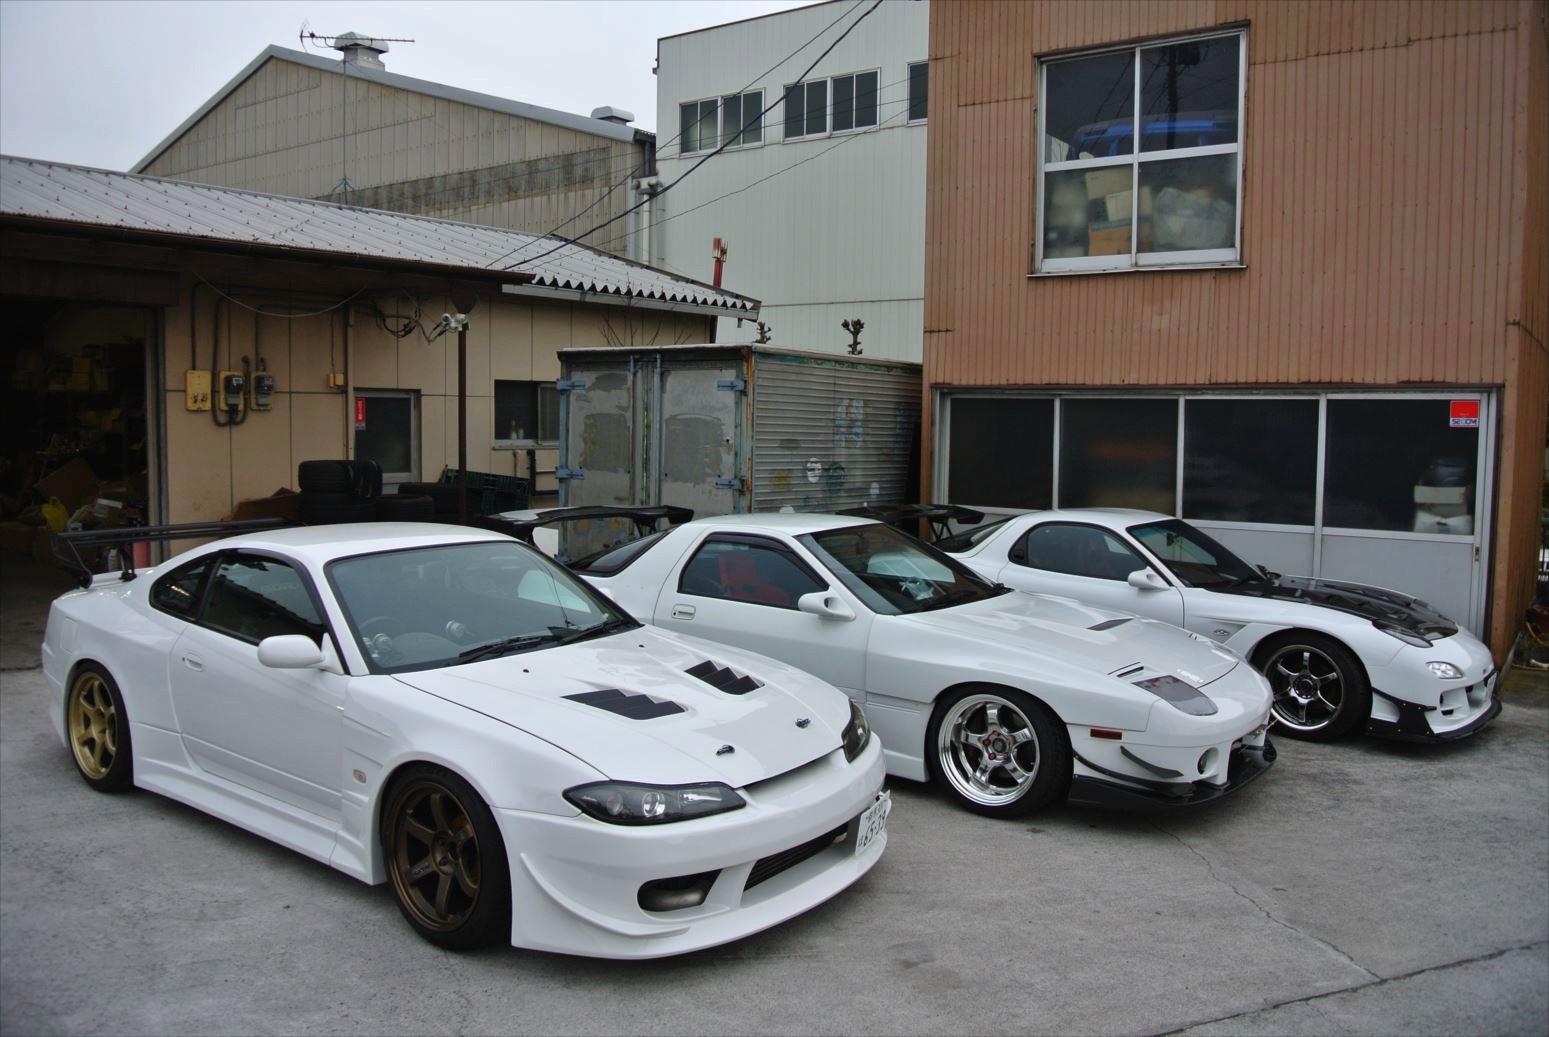 Nissan Silvia S15, Mazda RX-7 FC & FD, popularne sportowe samochody, auta do driftu, tuning